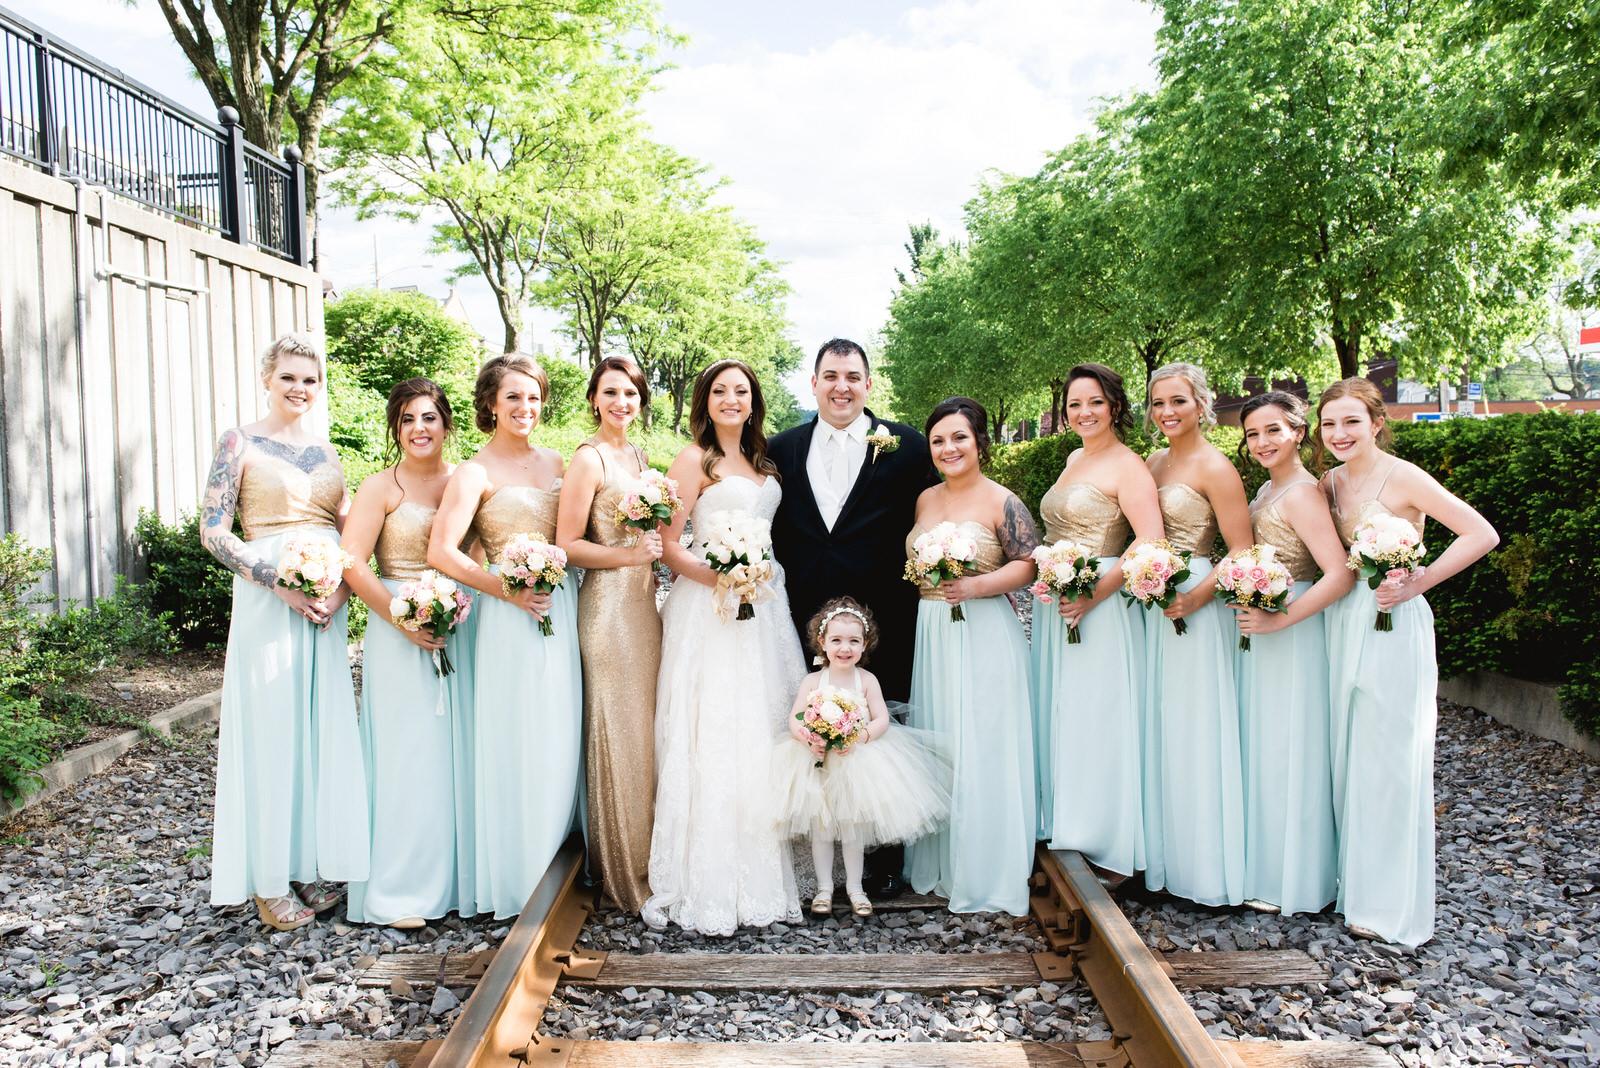 Laube_Banquet_Hall__Wedding_Photos_052.jpg